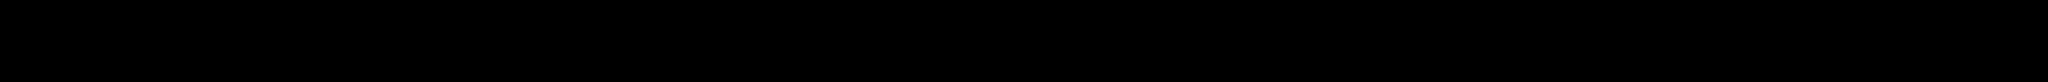 VAICO 8E9 955 407 A, 8E9 955 407 B, 8E9 955 407 C, 8E9 955 407 A, 8E9 955 407 B Tuulilasinpyyhkimen varsi, lasinpesu